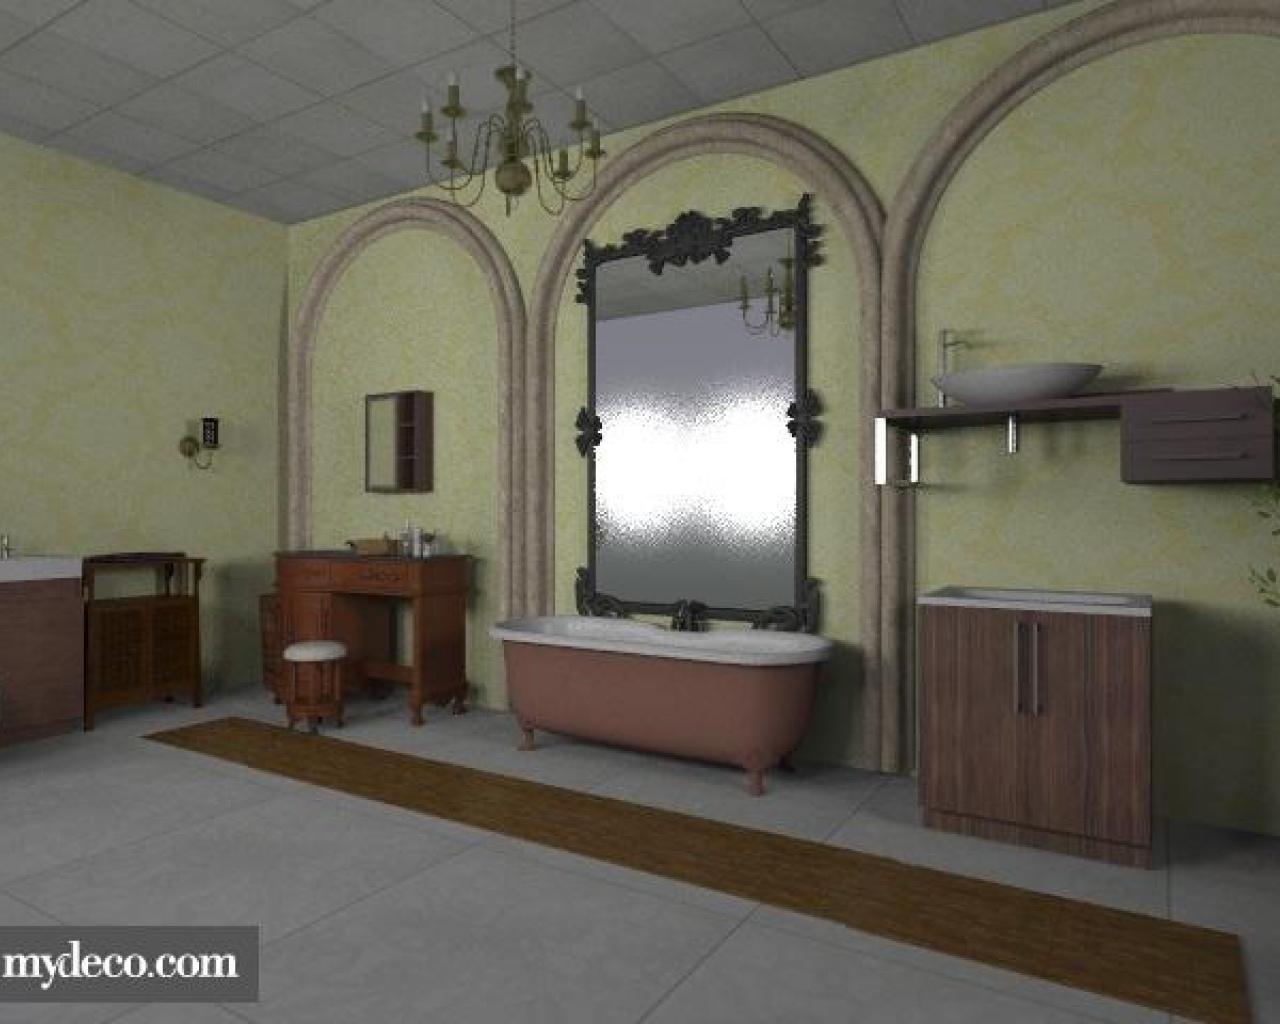 victorian-bathroom-3d-design-ioanavladut7-living-room-ideas-3d-ideas-bathroom-bathroom-3d-ideas.com-room-room-3d-room-3d-ideas-victorian-victorian-bathroom-44609